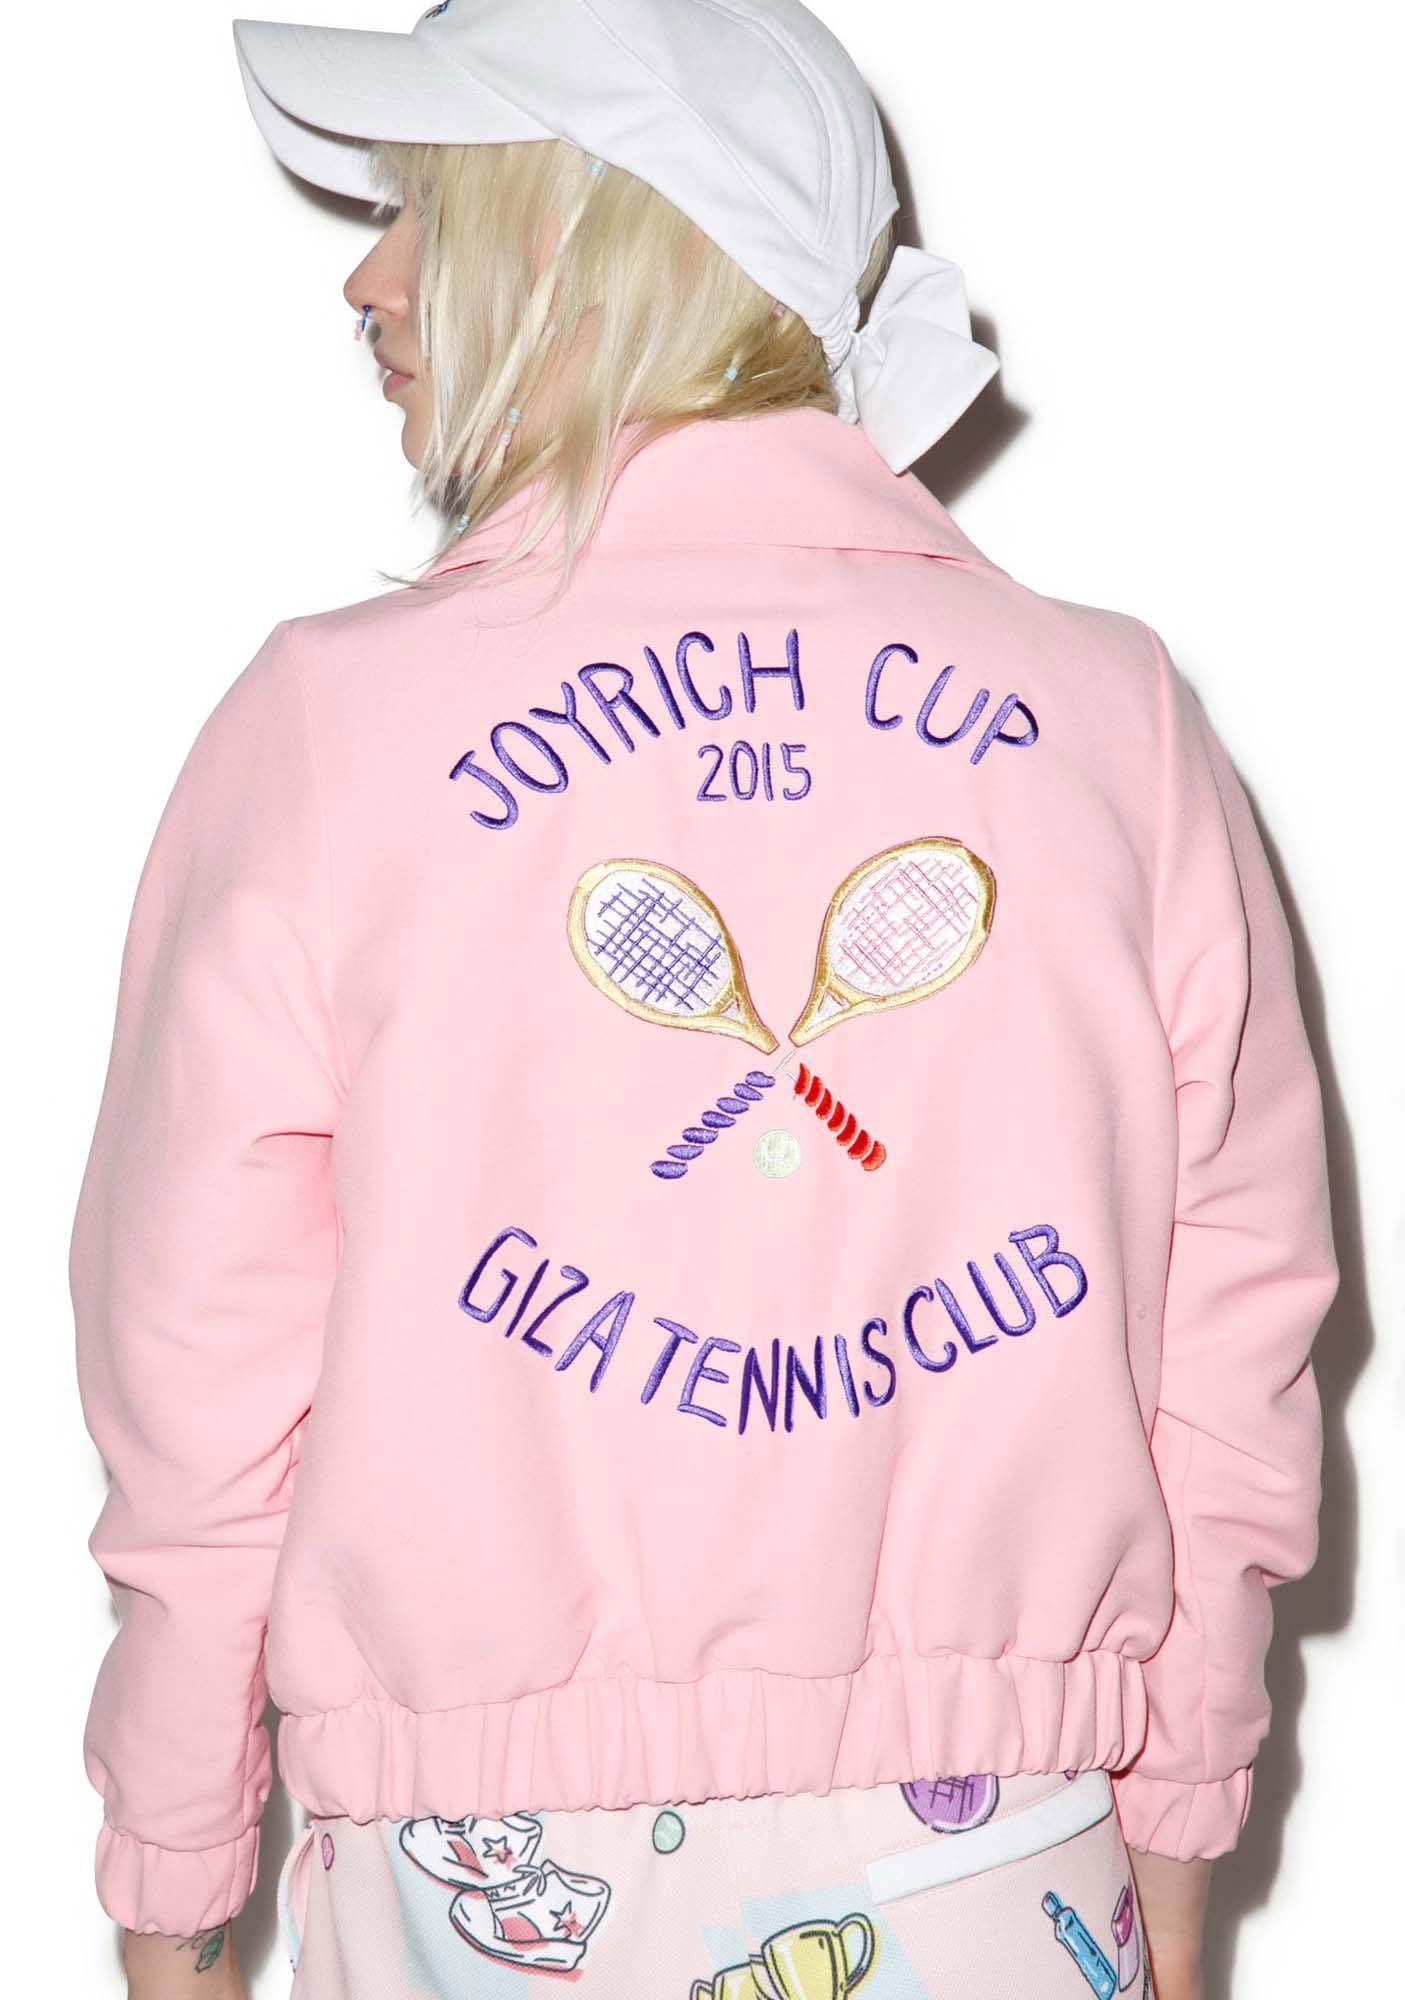 Joyrich X GIZA Tennis Club Cropped Jacket